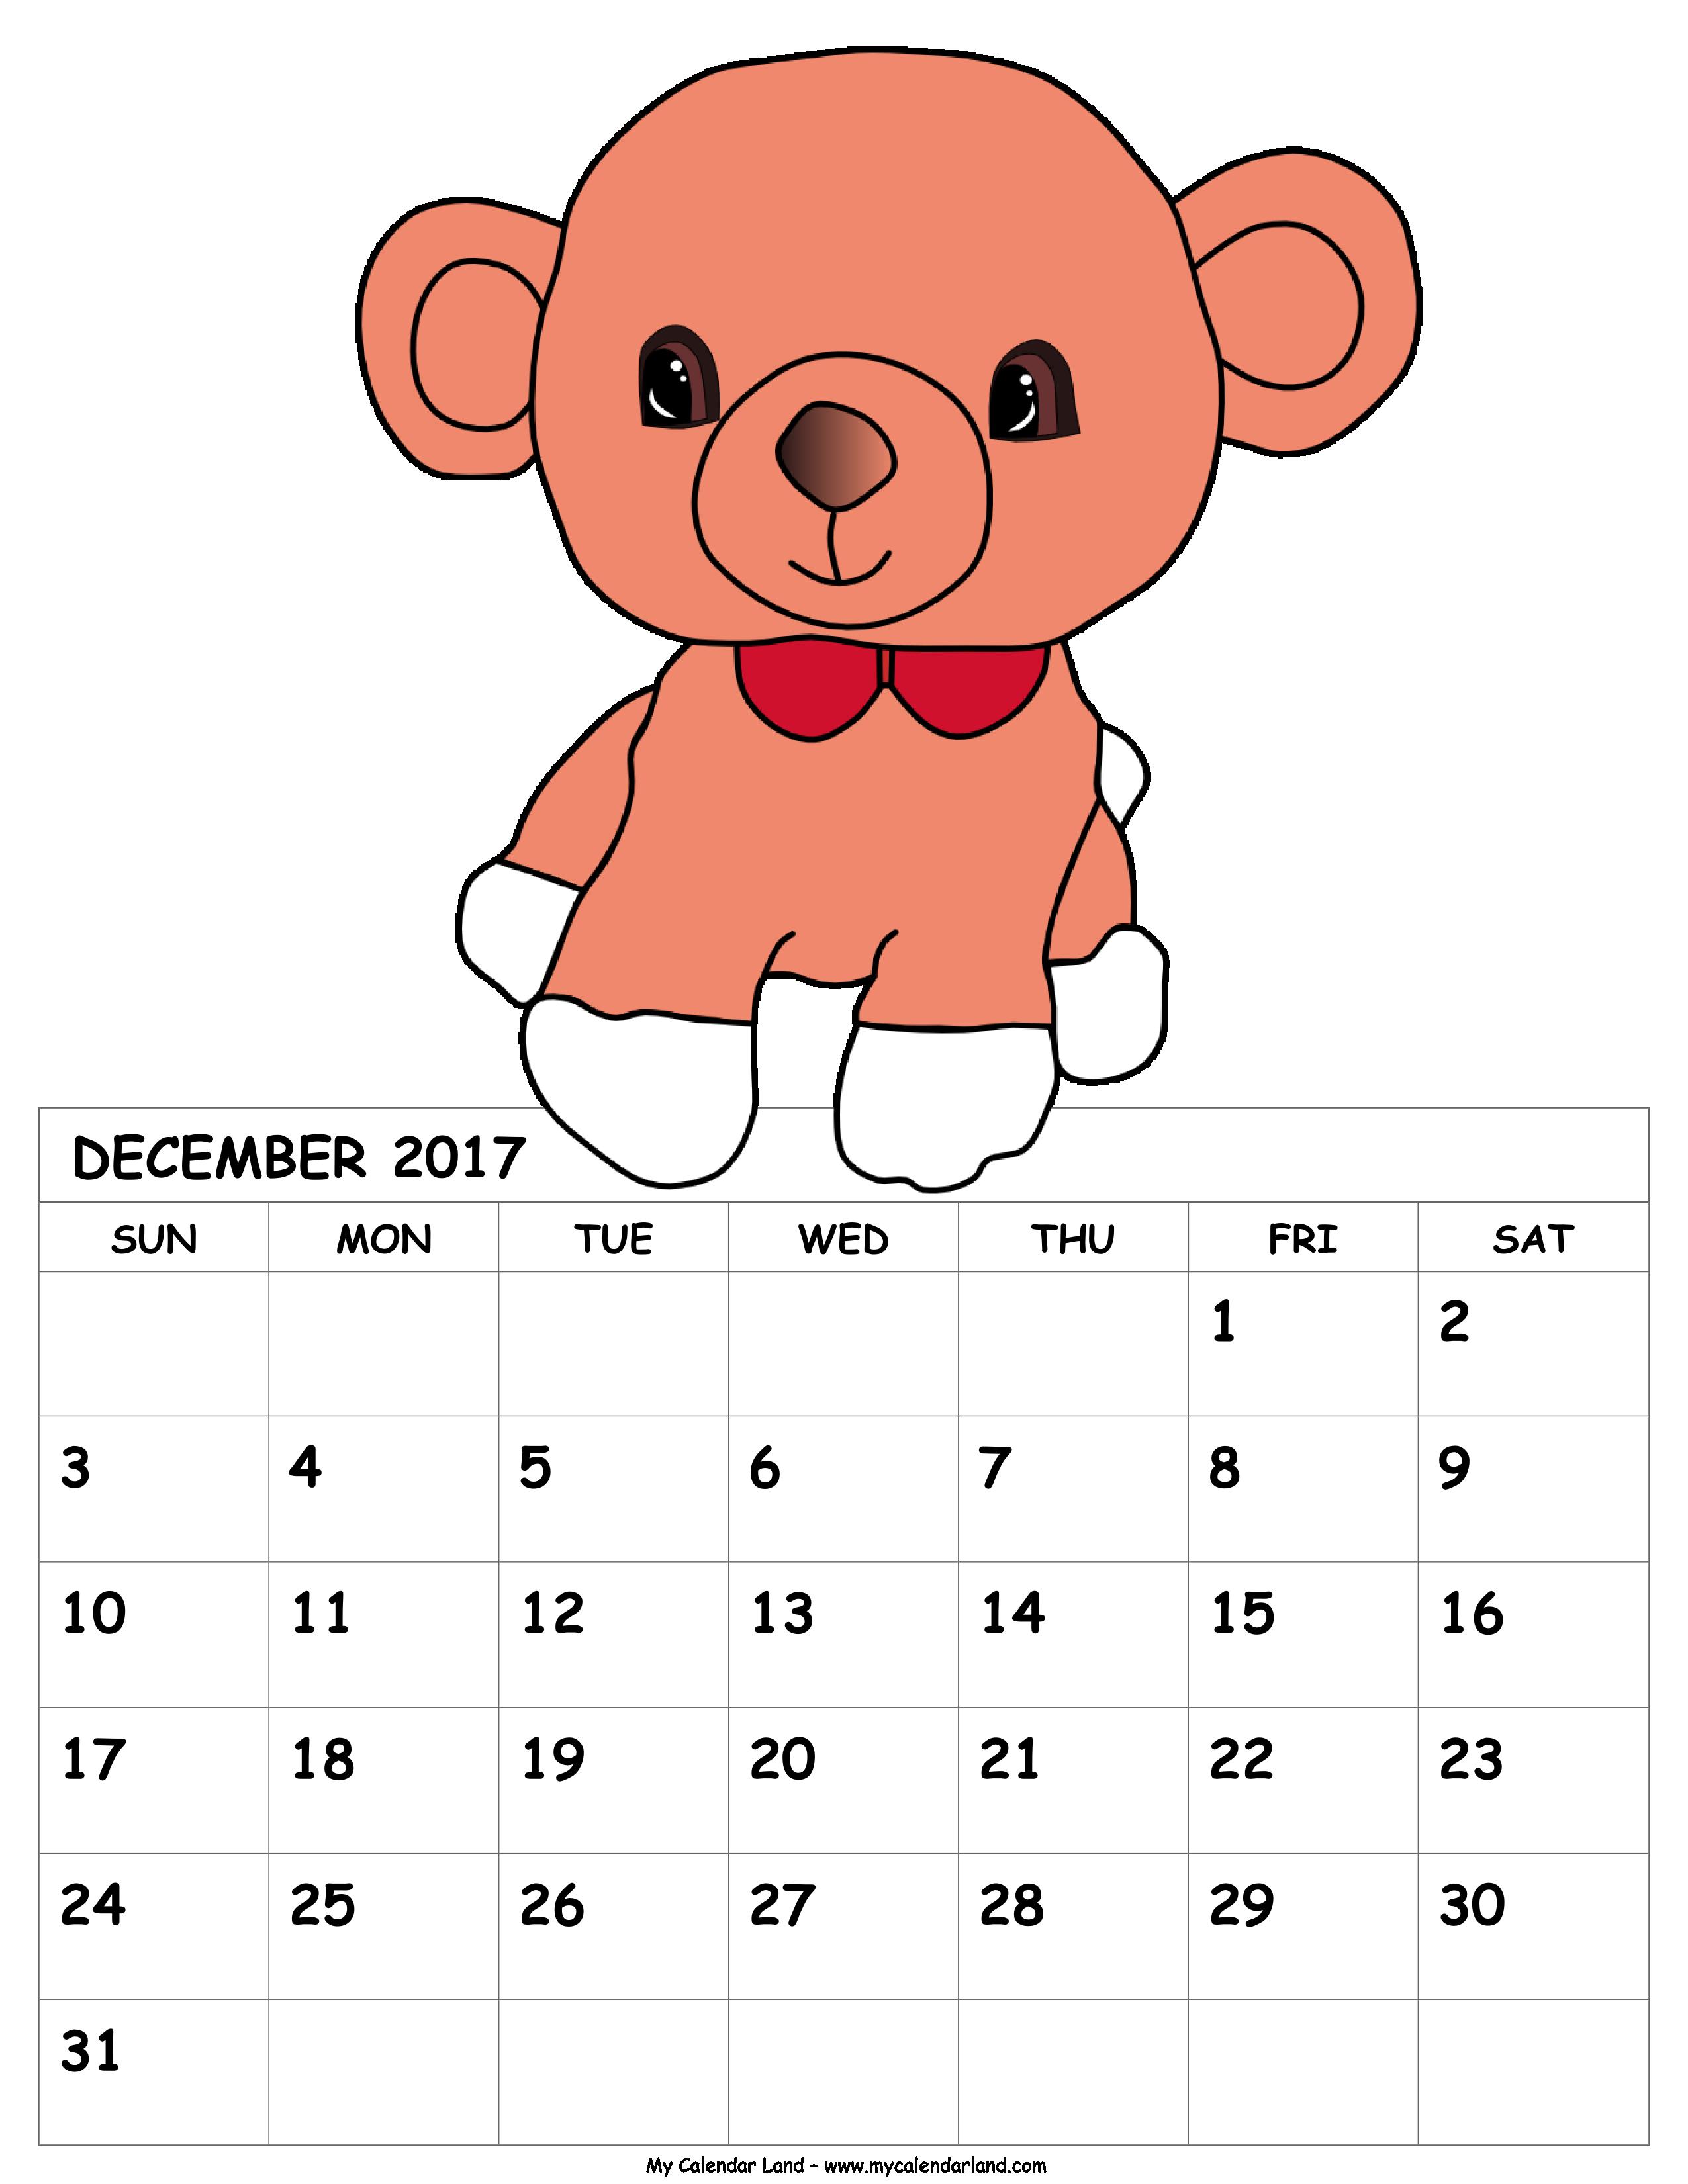 Monthly calendar november 2016 clipart banner royalty free December 2018 Calendar - My Calendar Land banner royalty free